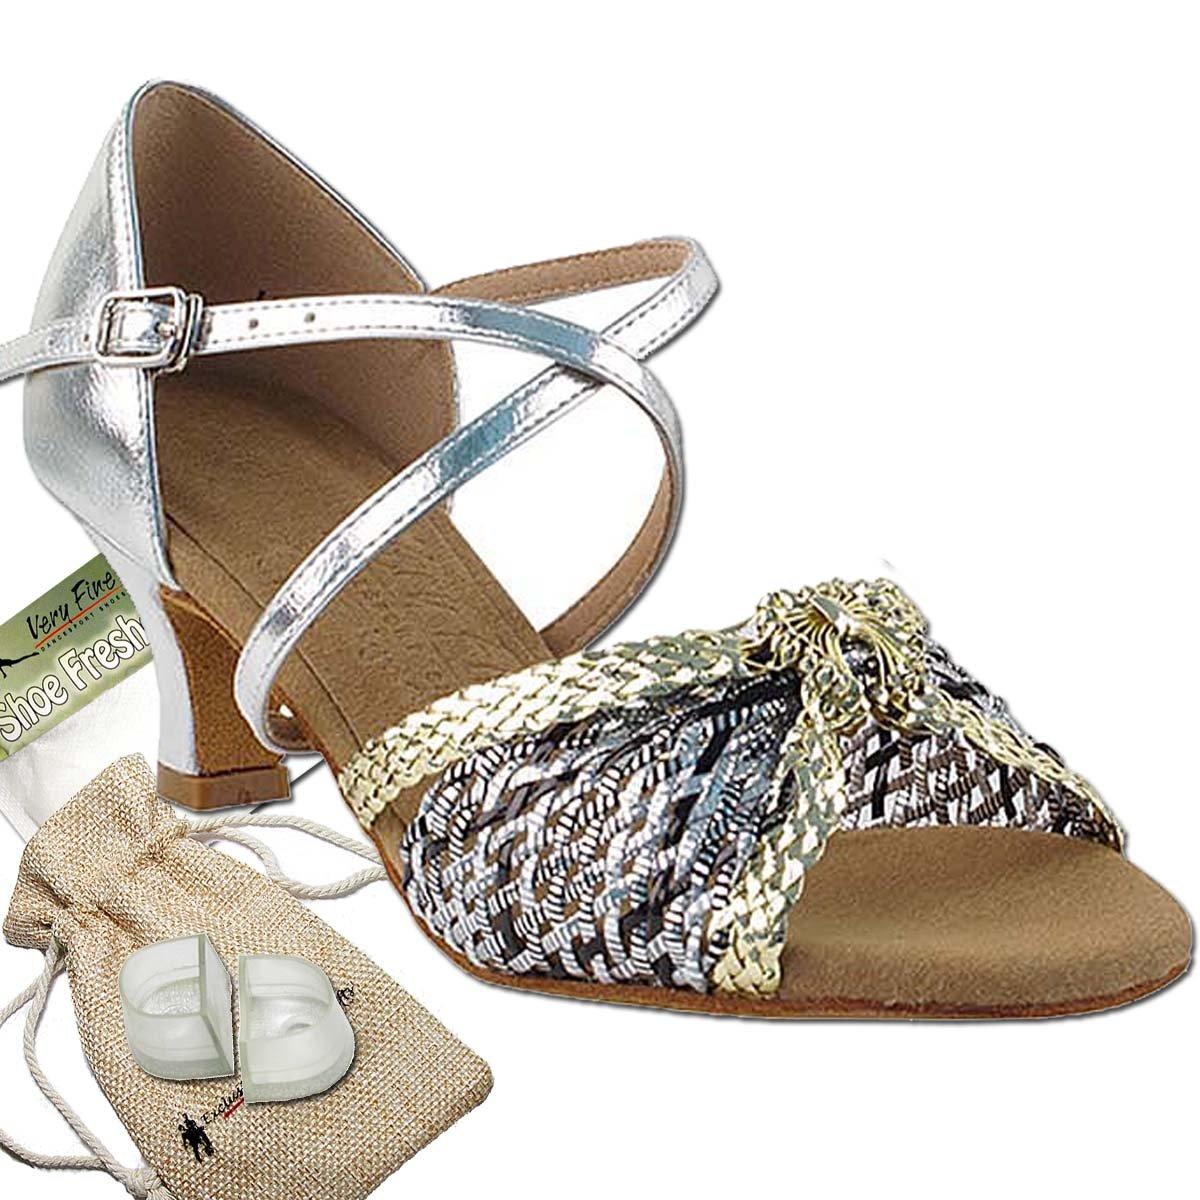 [Very Fine Dance Shoes] レディース B072QBT2PV Gold & Silver Braid 7.5 B(M) US